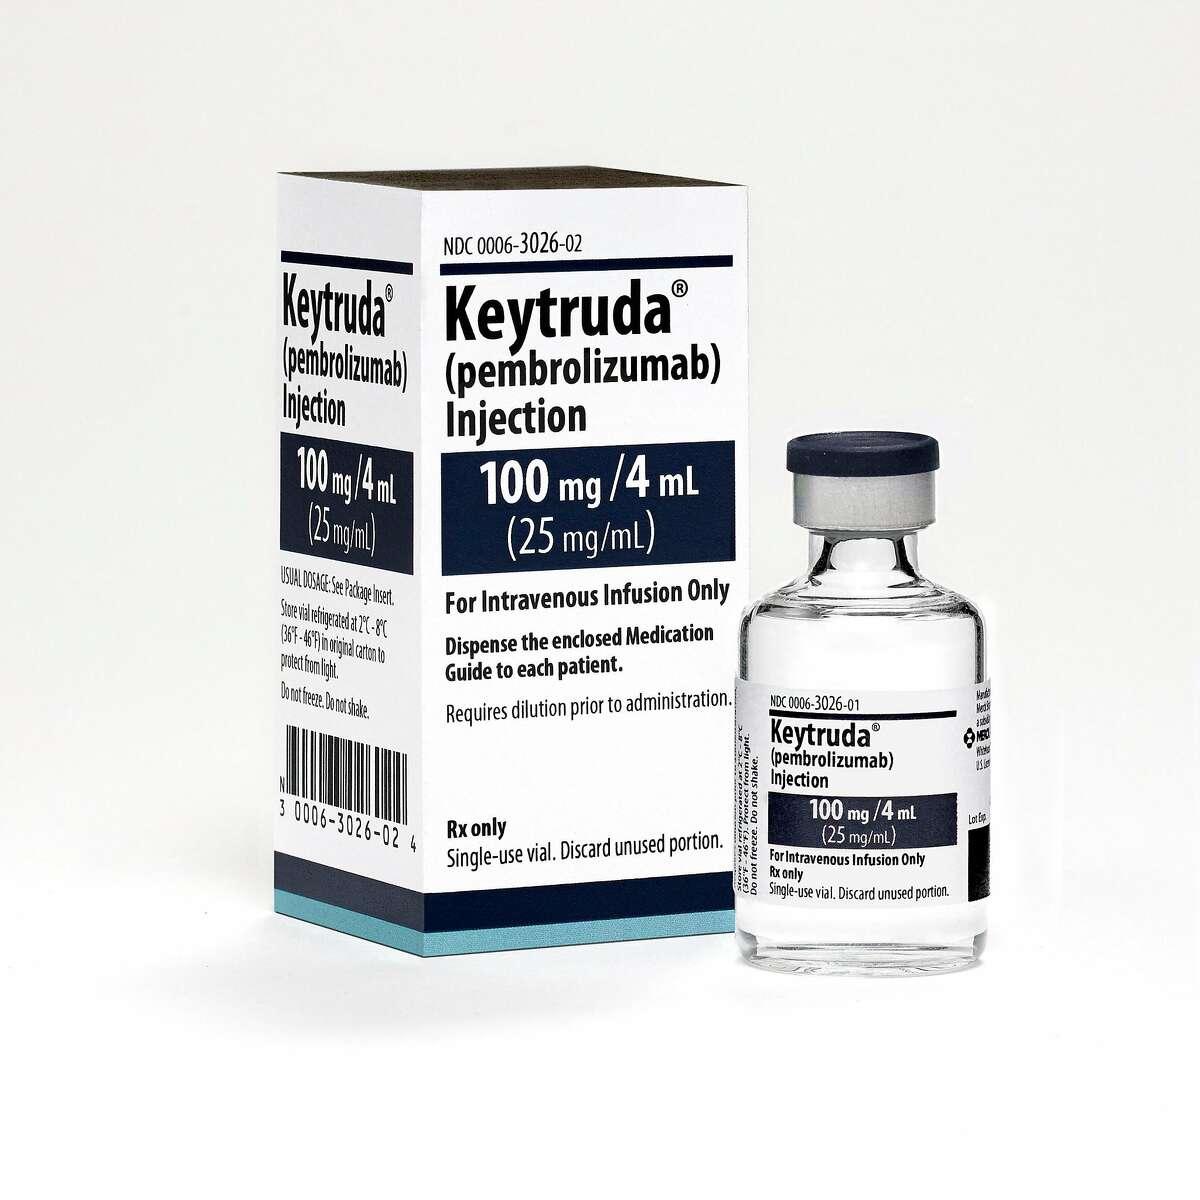 Keytruda is a prescription medicine used to treat a kind of skin cancer called melanoma Keytruda 100mg/4mL Vial and Carton 2015 (Michael Lund/Merck Global Creative Studios)